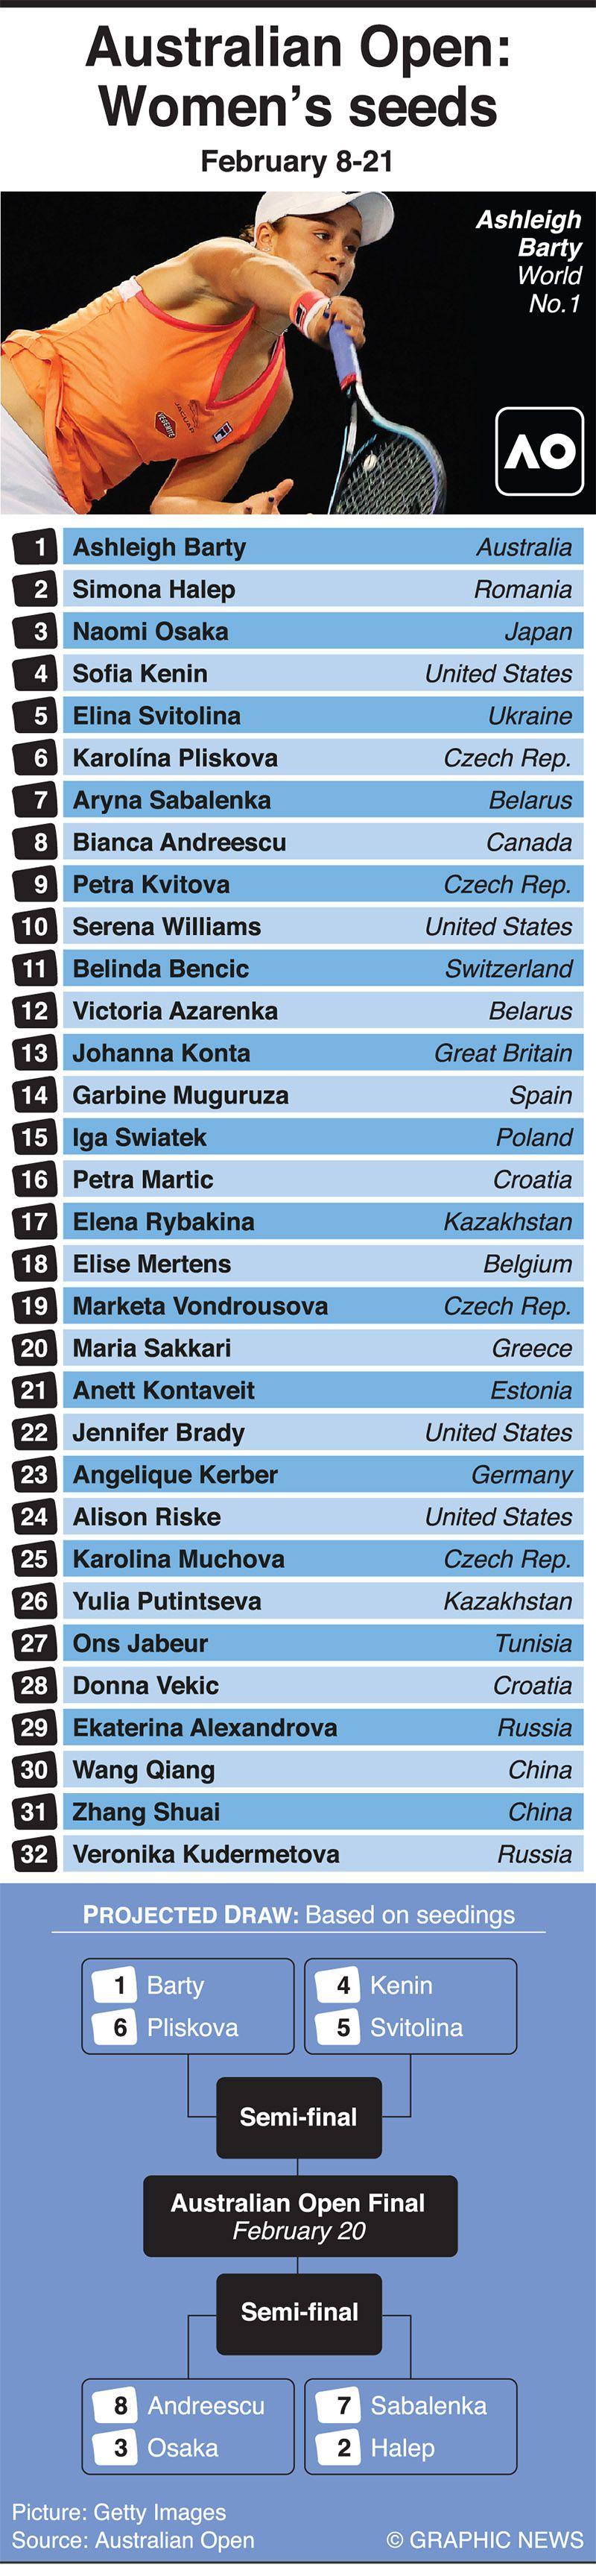 Infographic: Australian Open women's seeds 2021